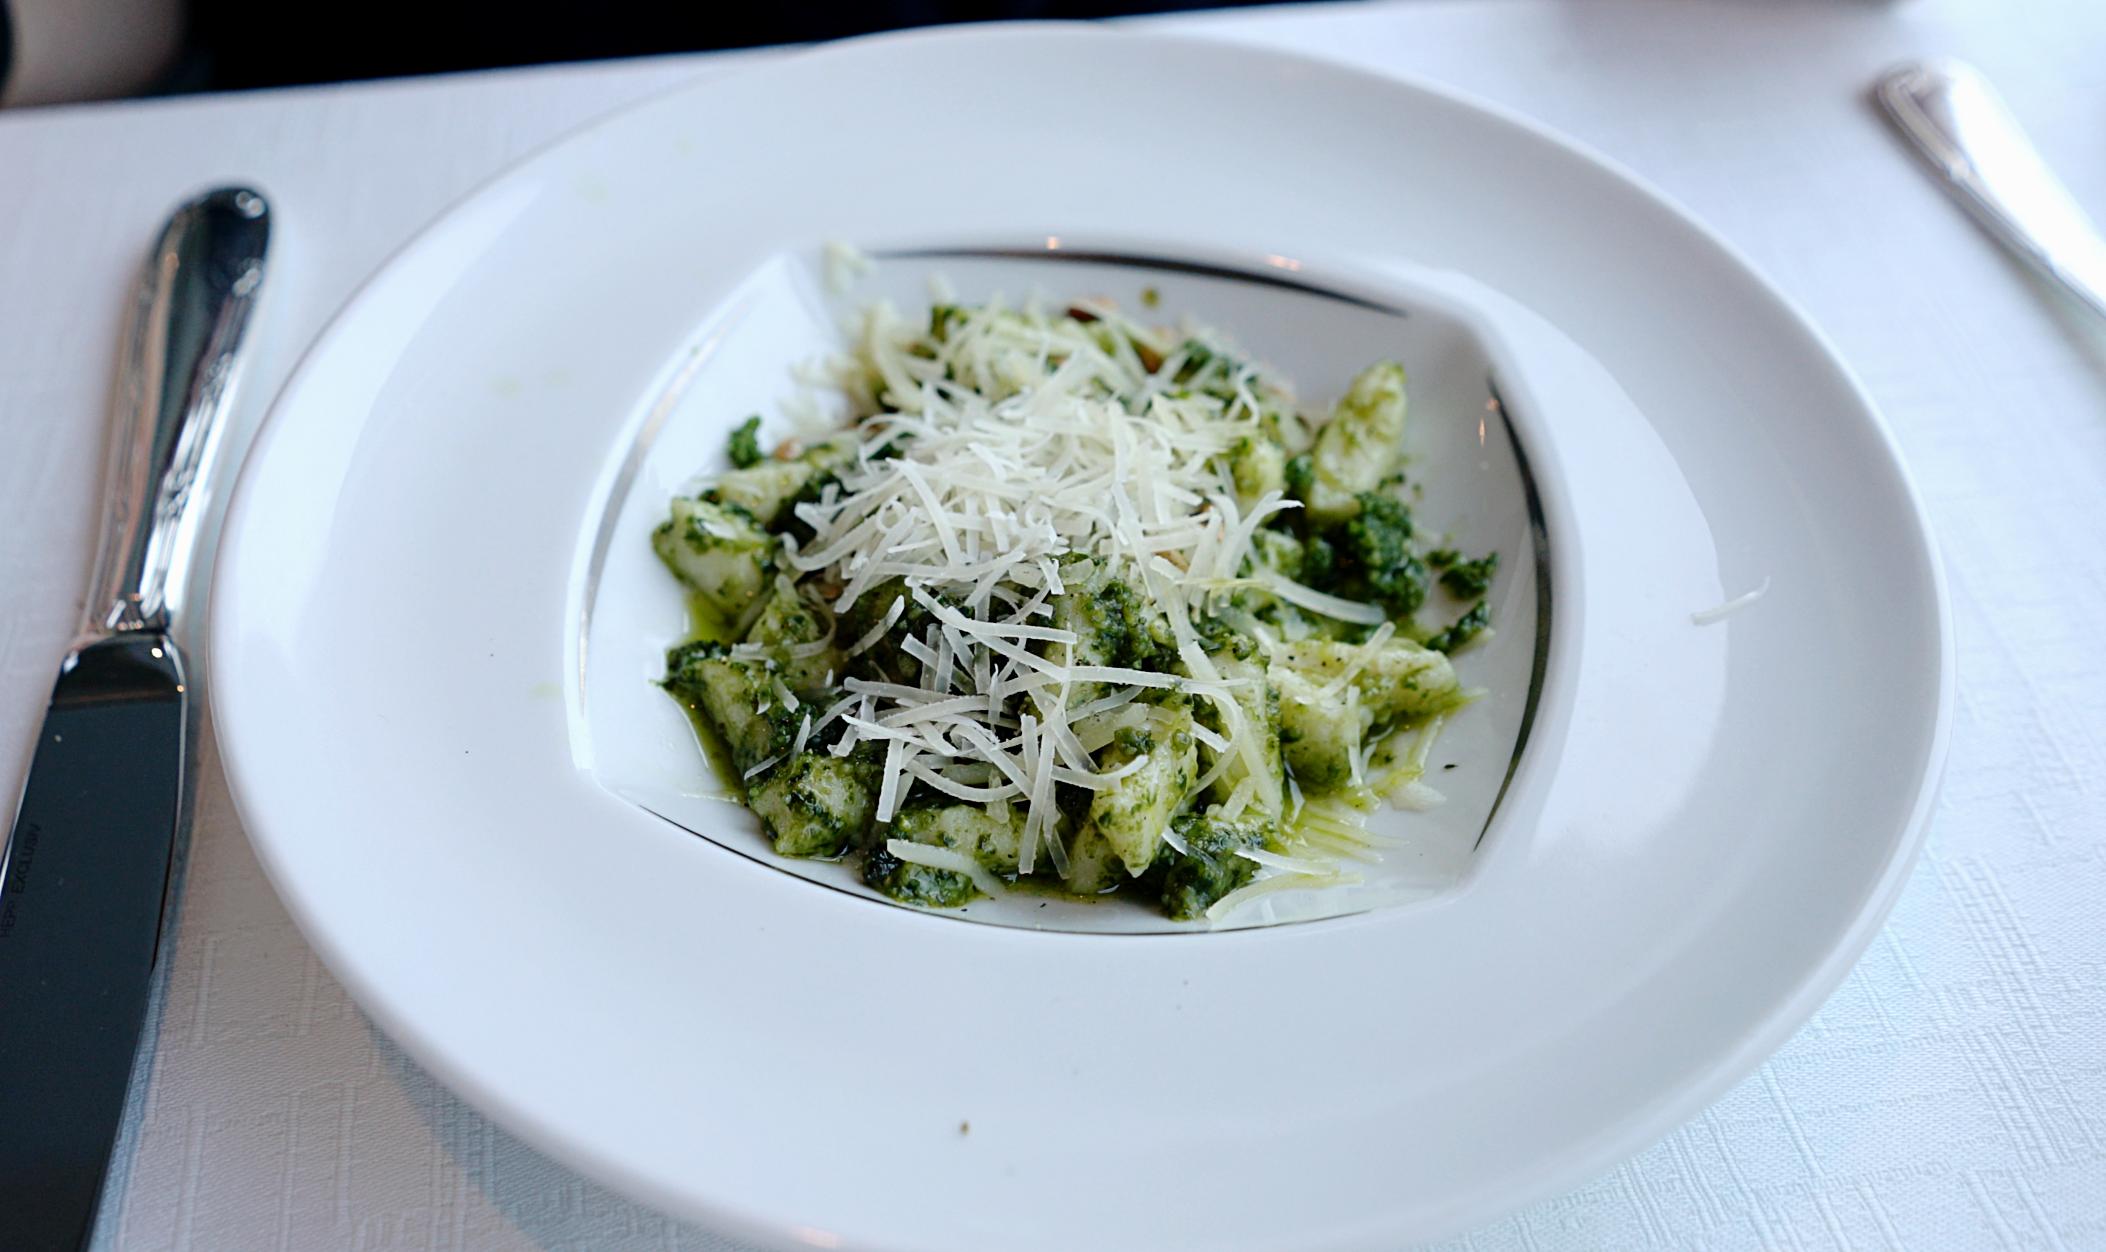 The Gnocchi starter in the Aqualina restaurant.